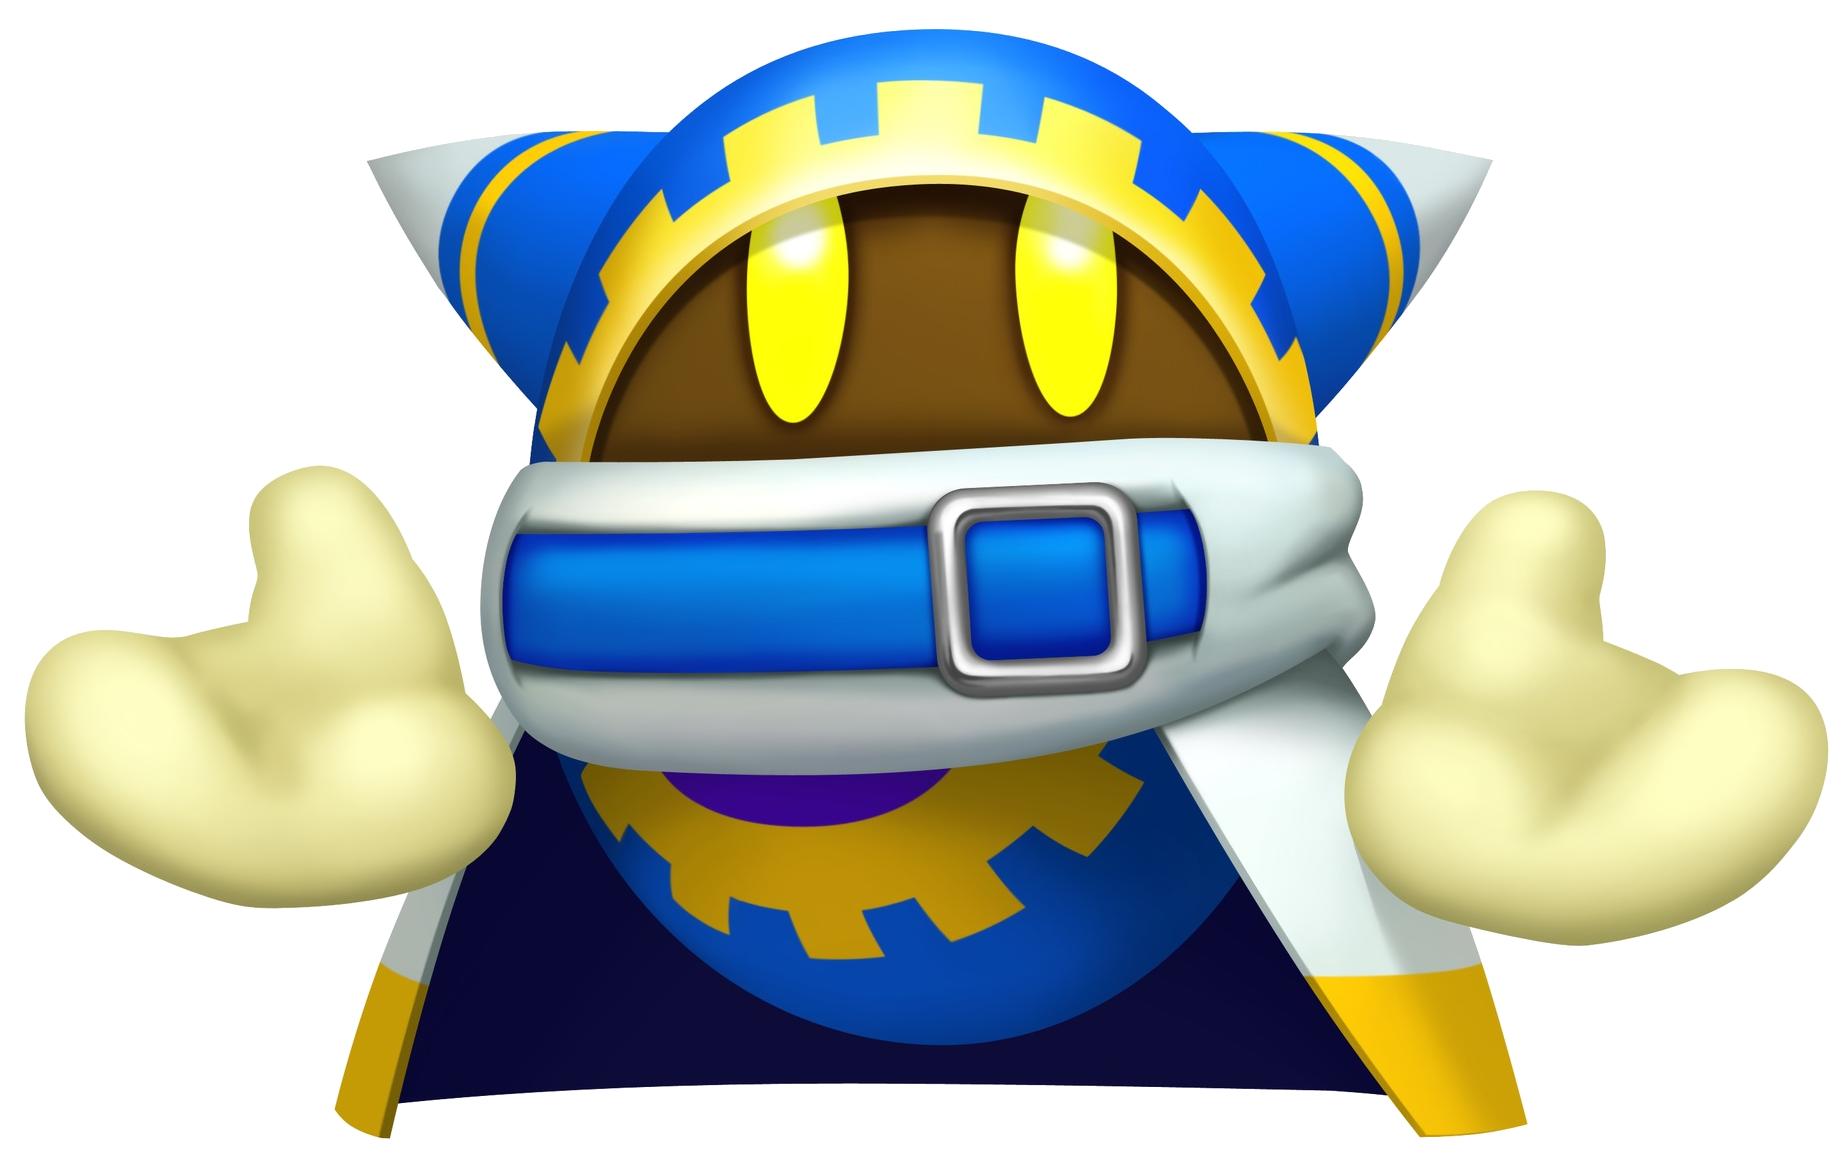 Anime Characters Kirby Wiki : Magolor kirby wiki fandom powered by wikia